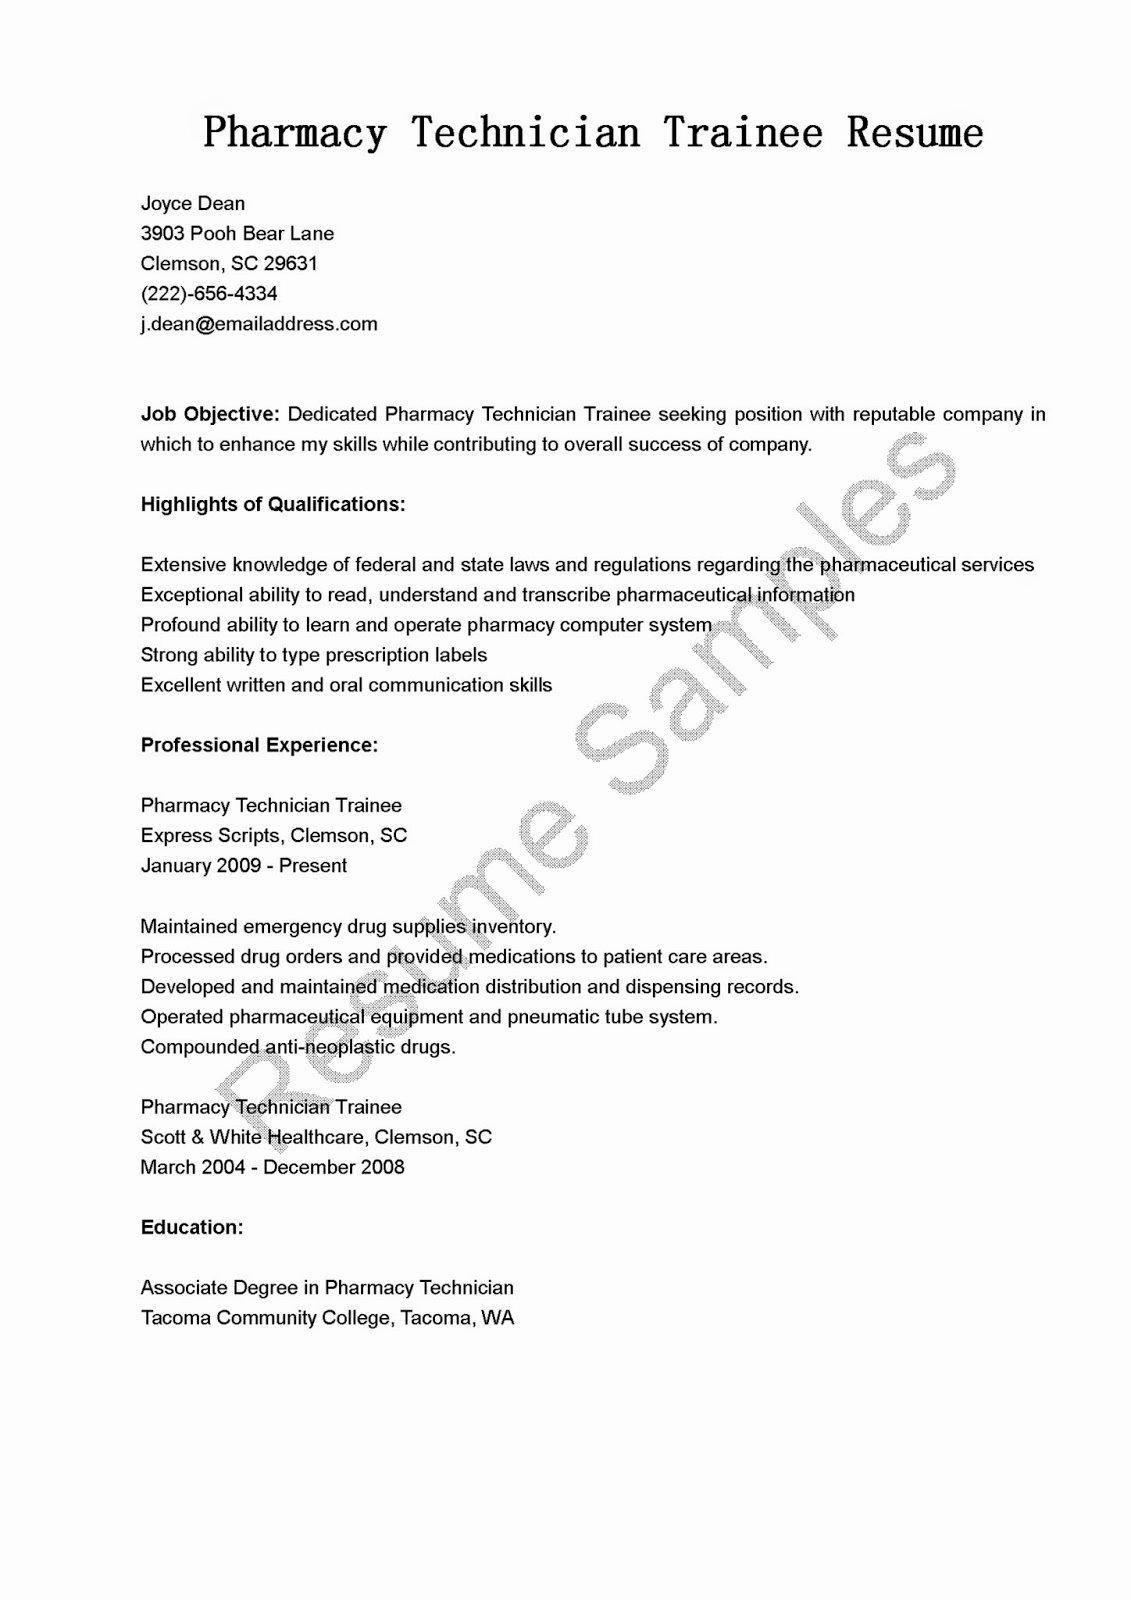 Resume Samples Pharmacy Technician Trainee Resume Sample